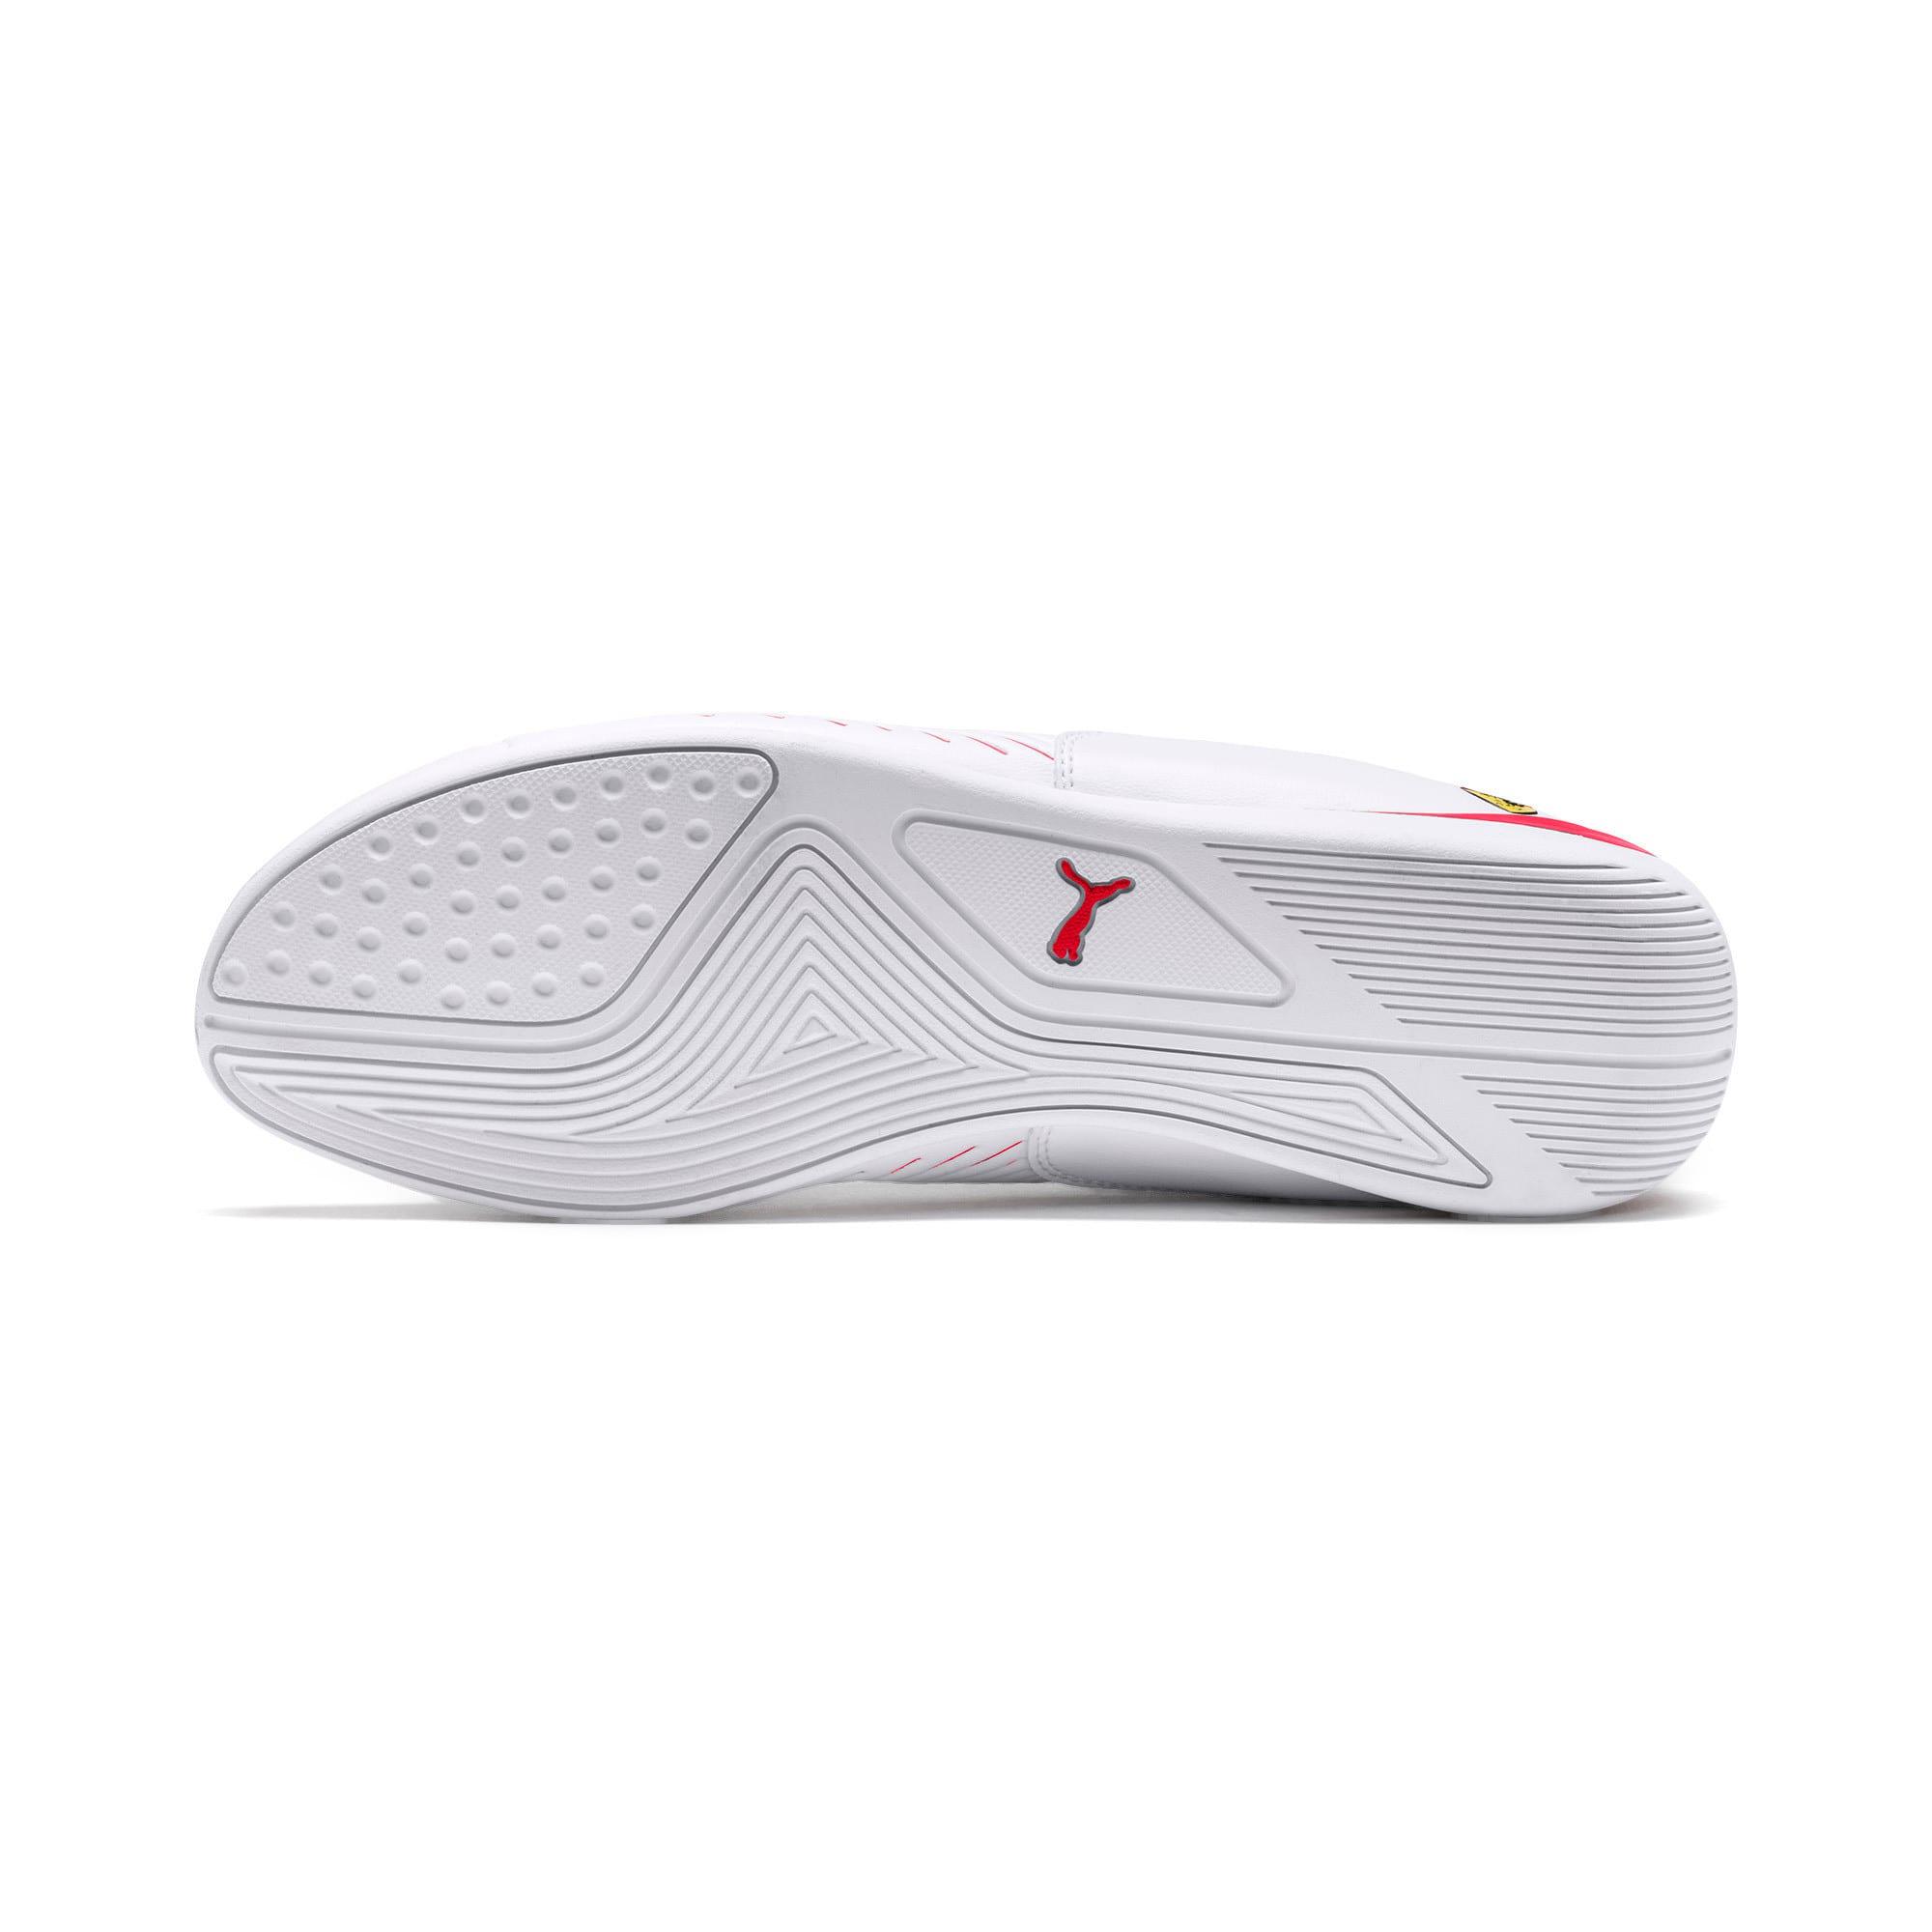 Thumbnail 4 of Scuderia Ferrari Drift Cat 7S Ultra Men's Shoes, Puma White-Rosso Corsa, medium